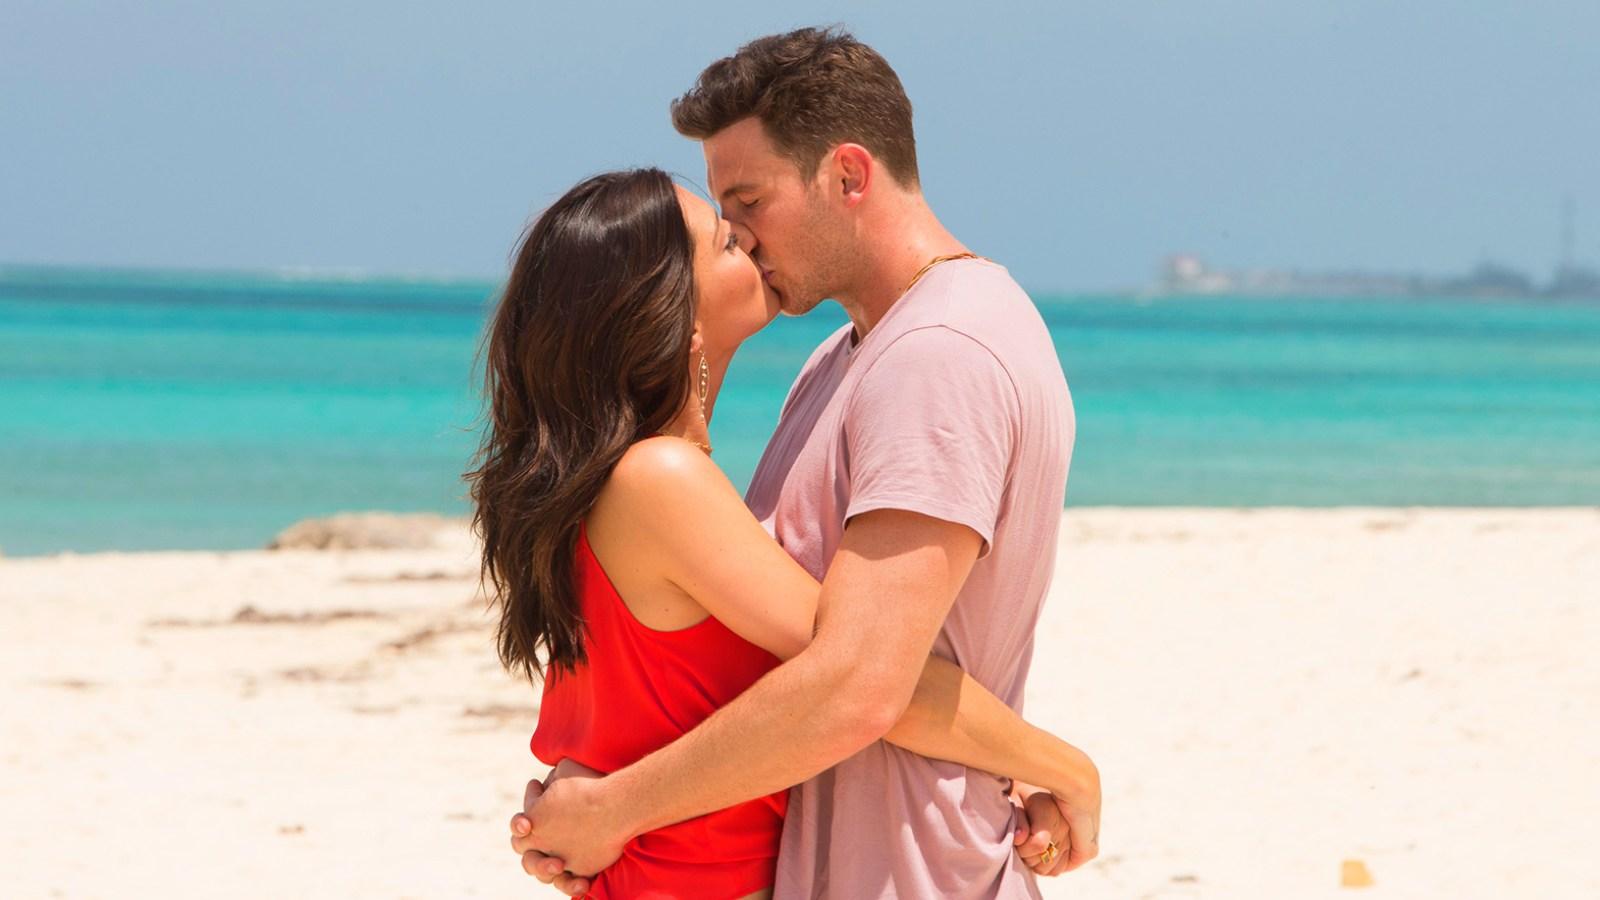 The Bachelorette\' Recap: Becca Sympathizes With Arie Luyendyk Jr.